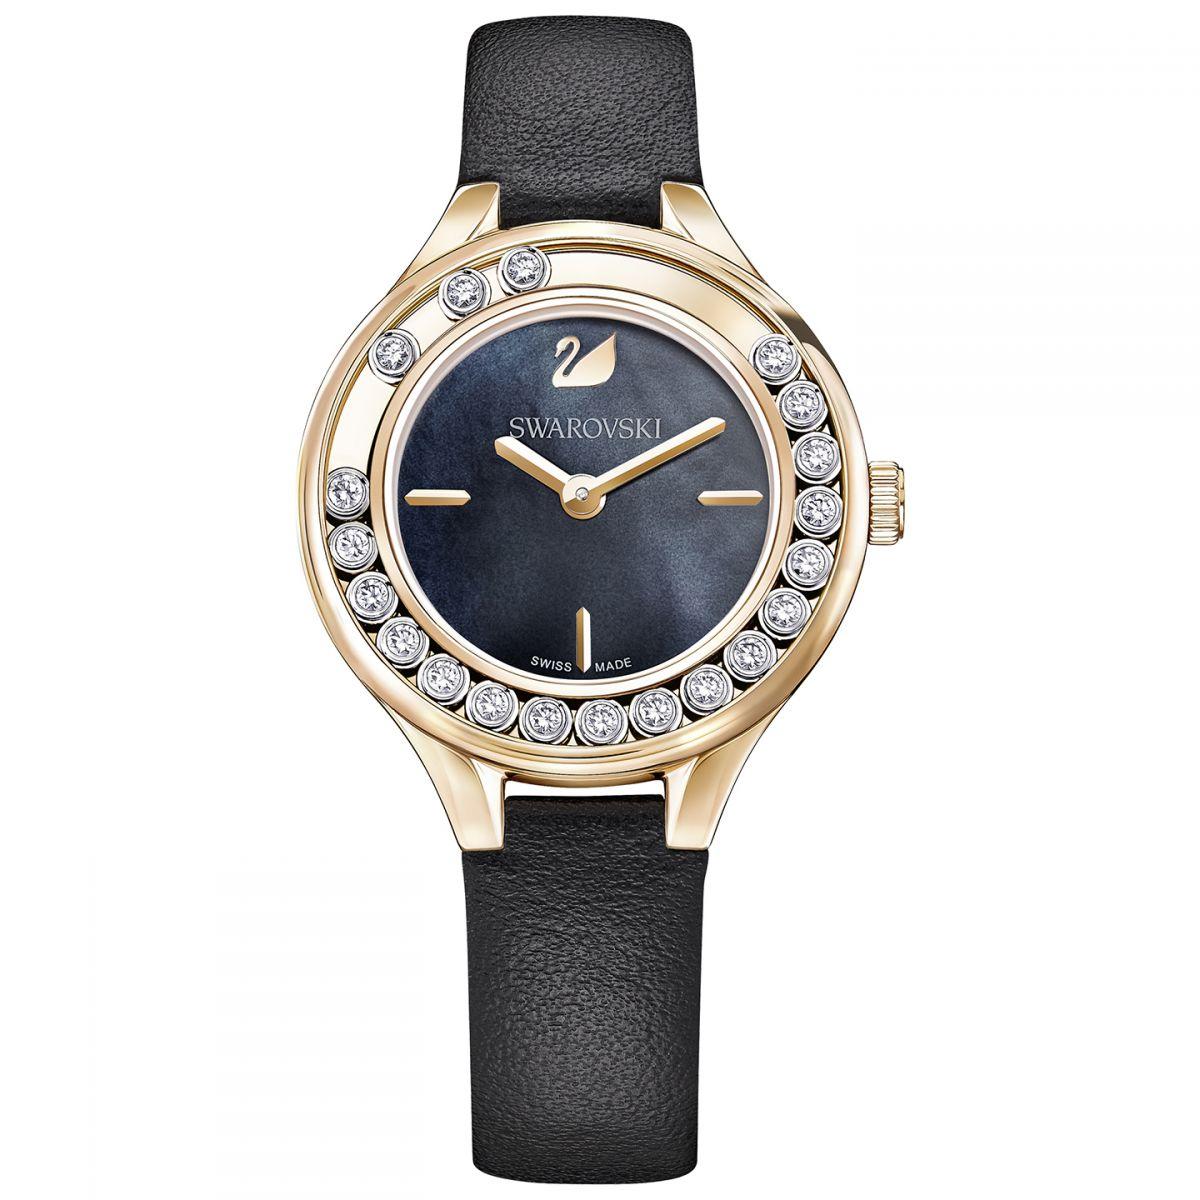 Ladies swarovski lovely crystals watch 5301877 for Swarovski crystals watch